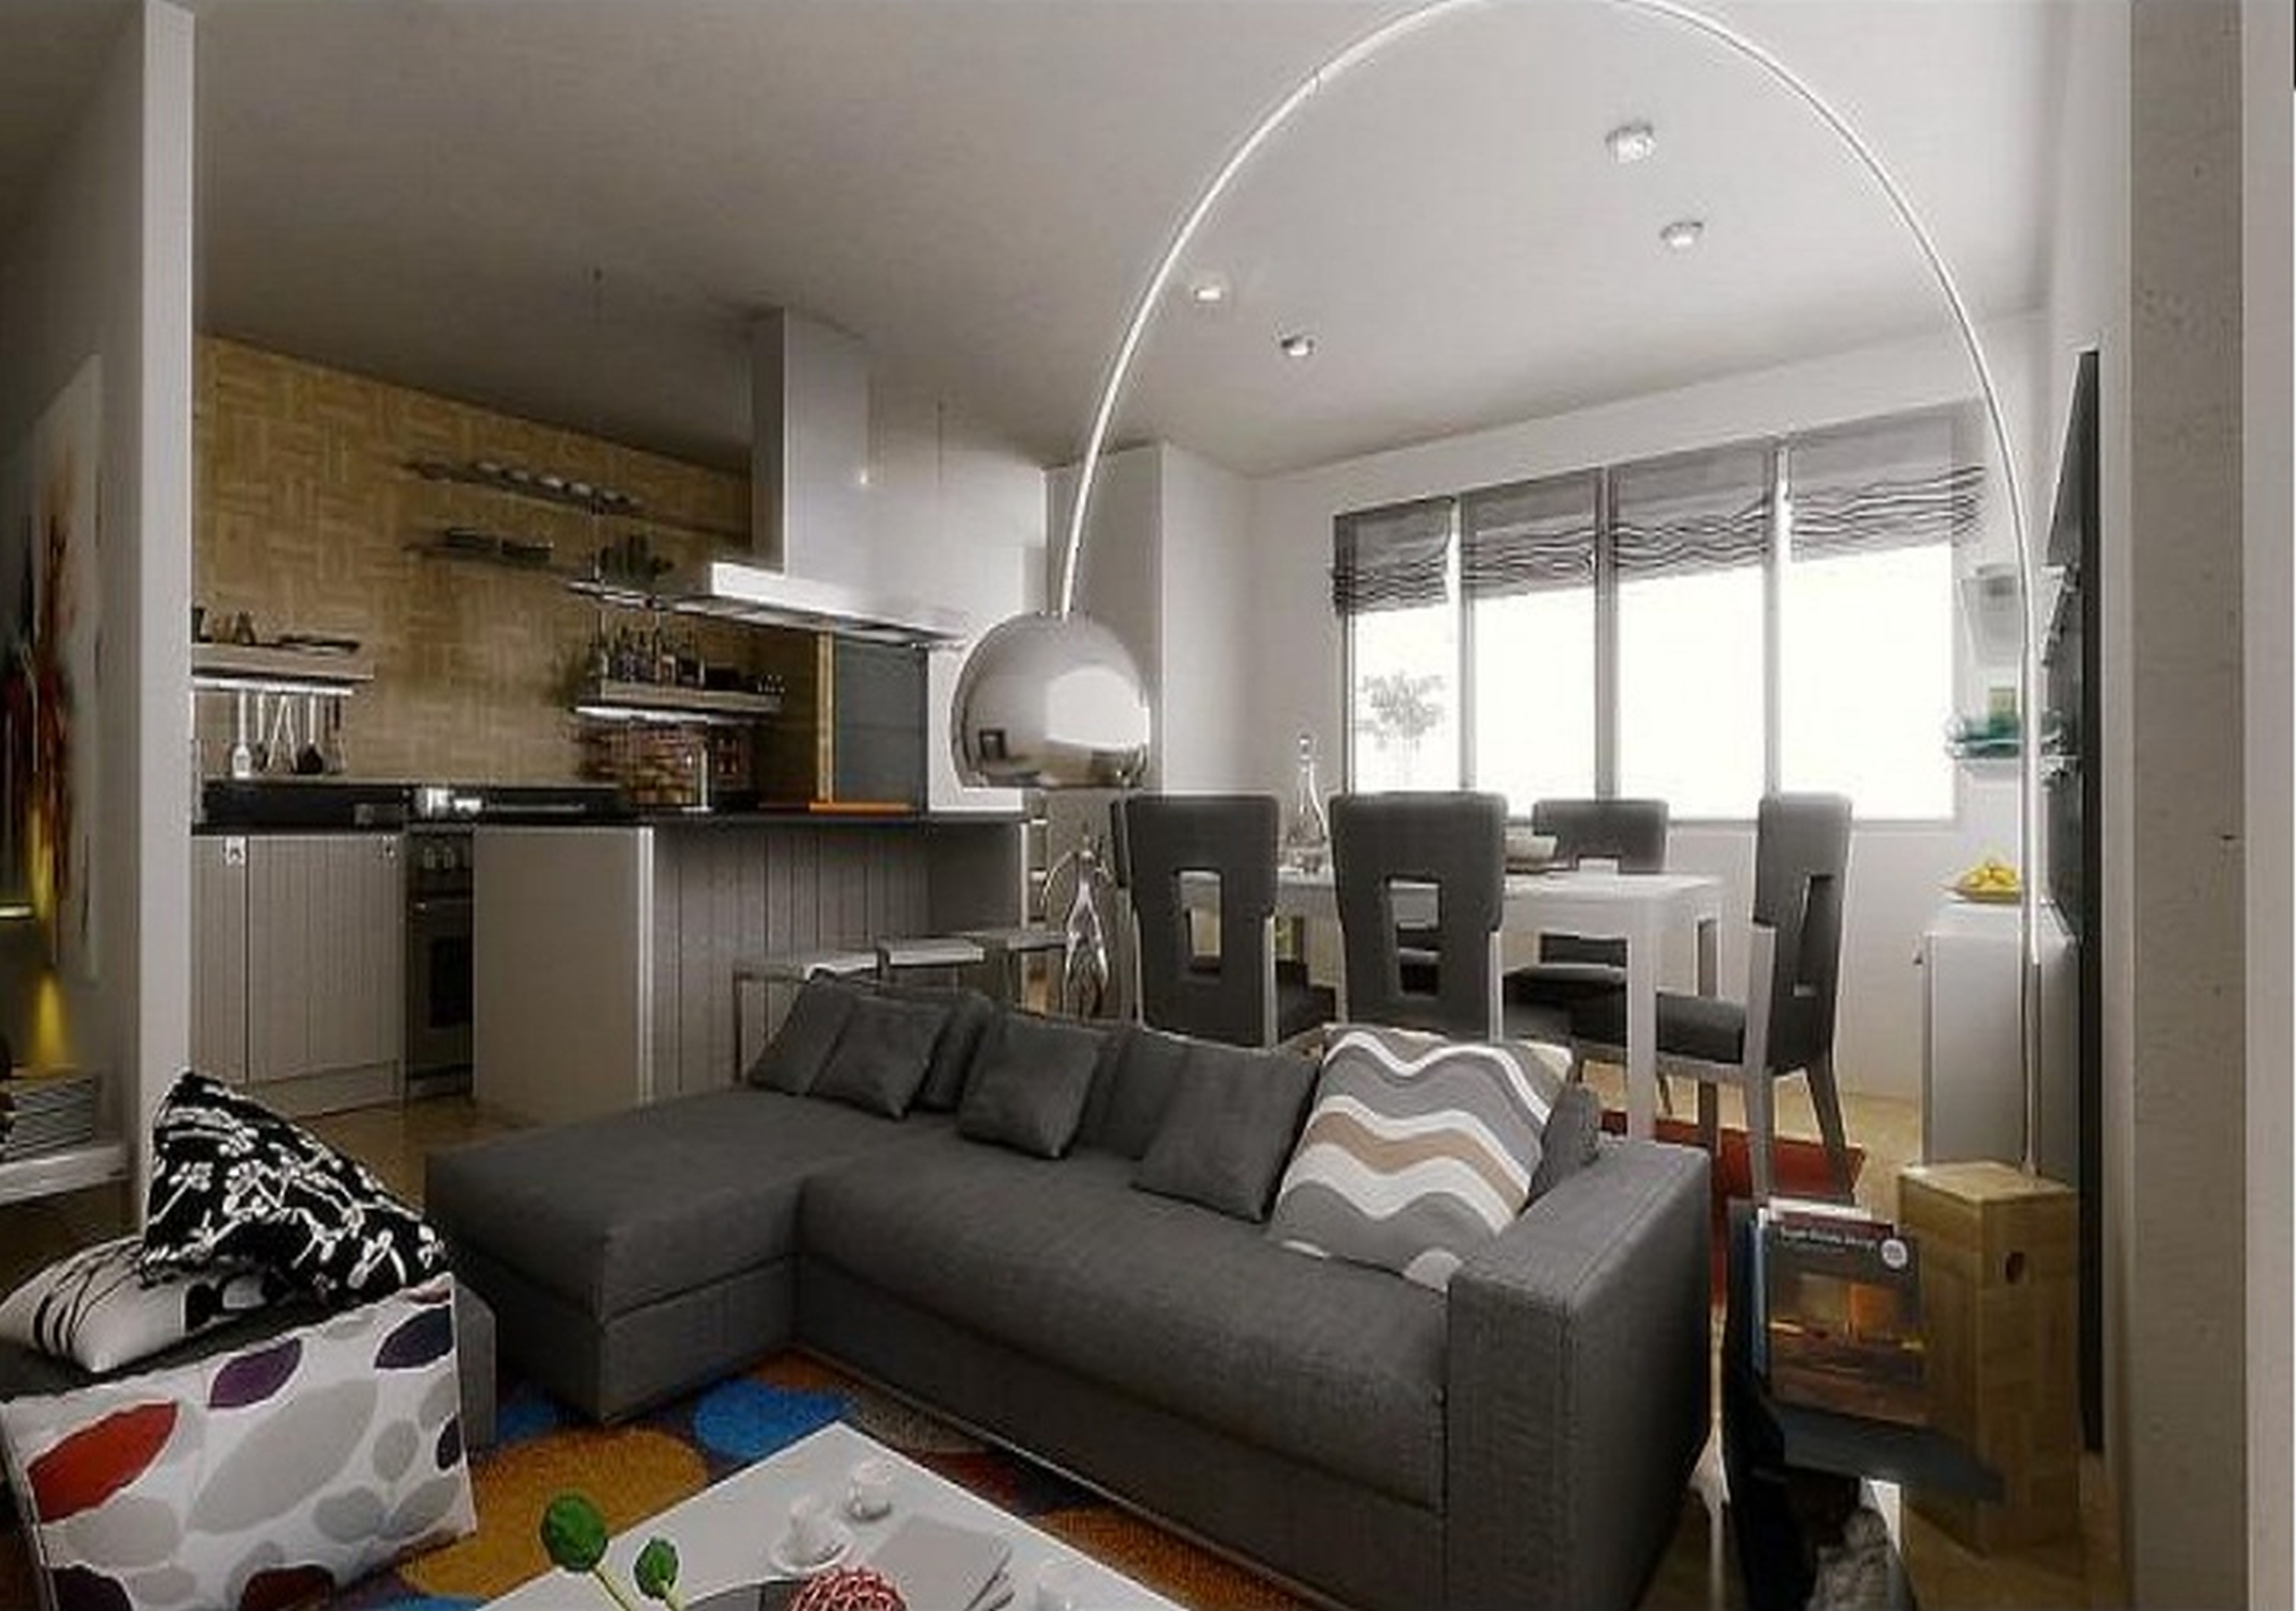 apartment living room design living room furniture ideas for decorating apartments design small impressive apartment NFQKBGM